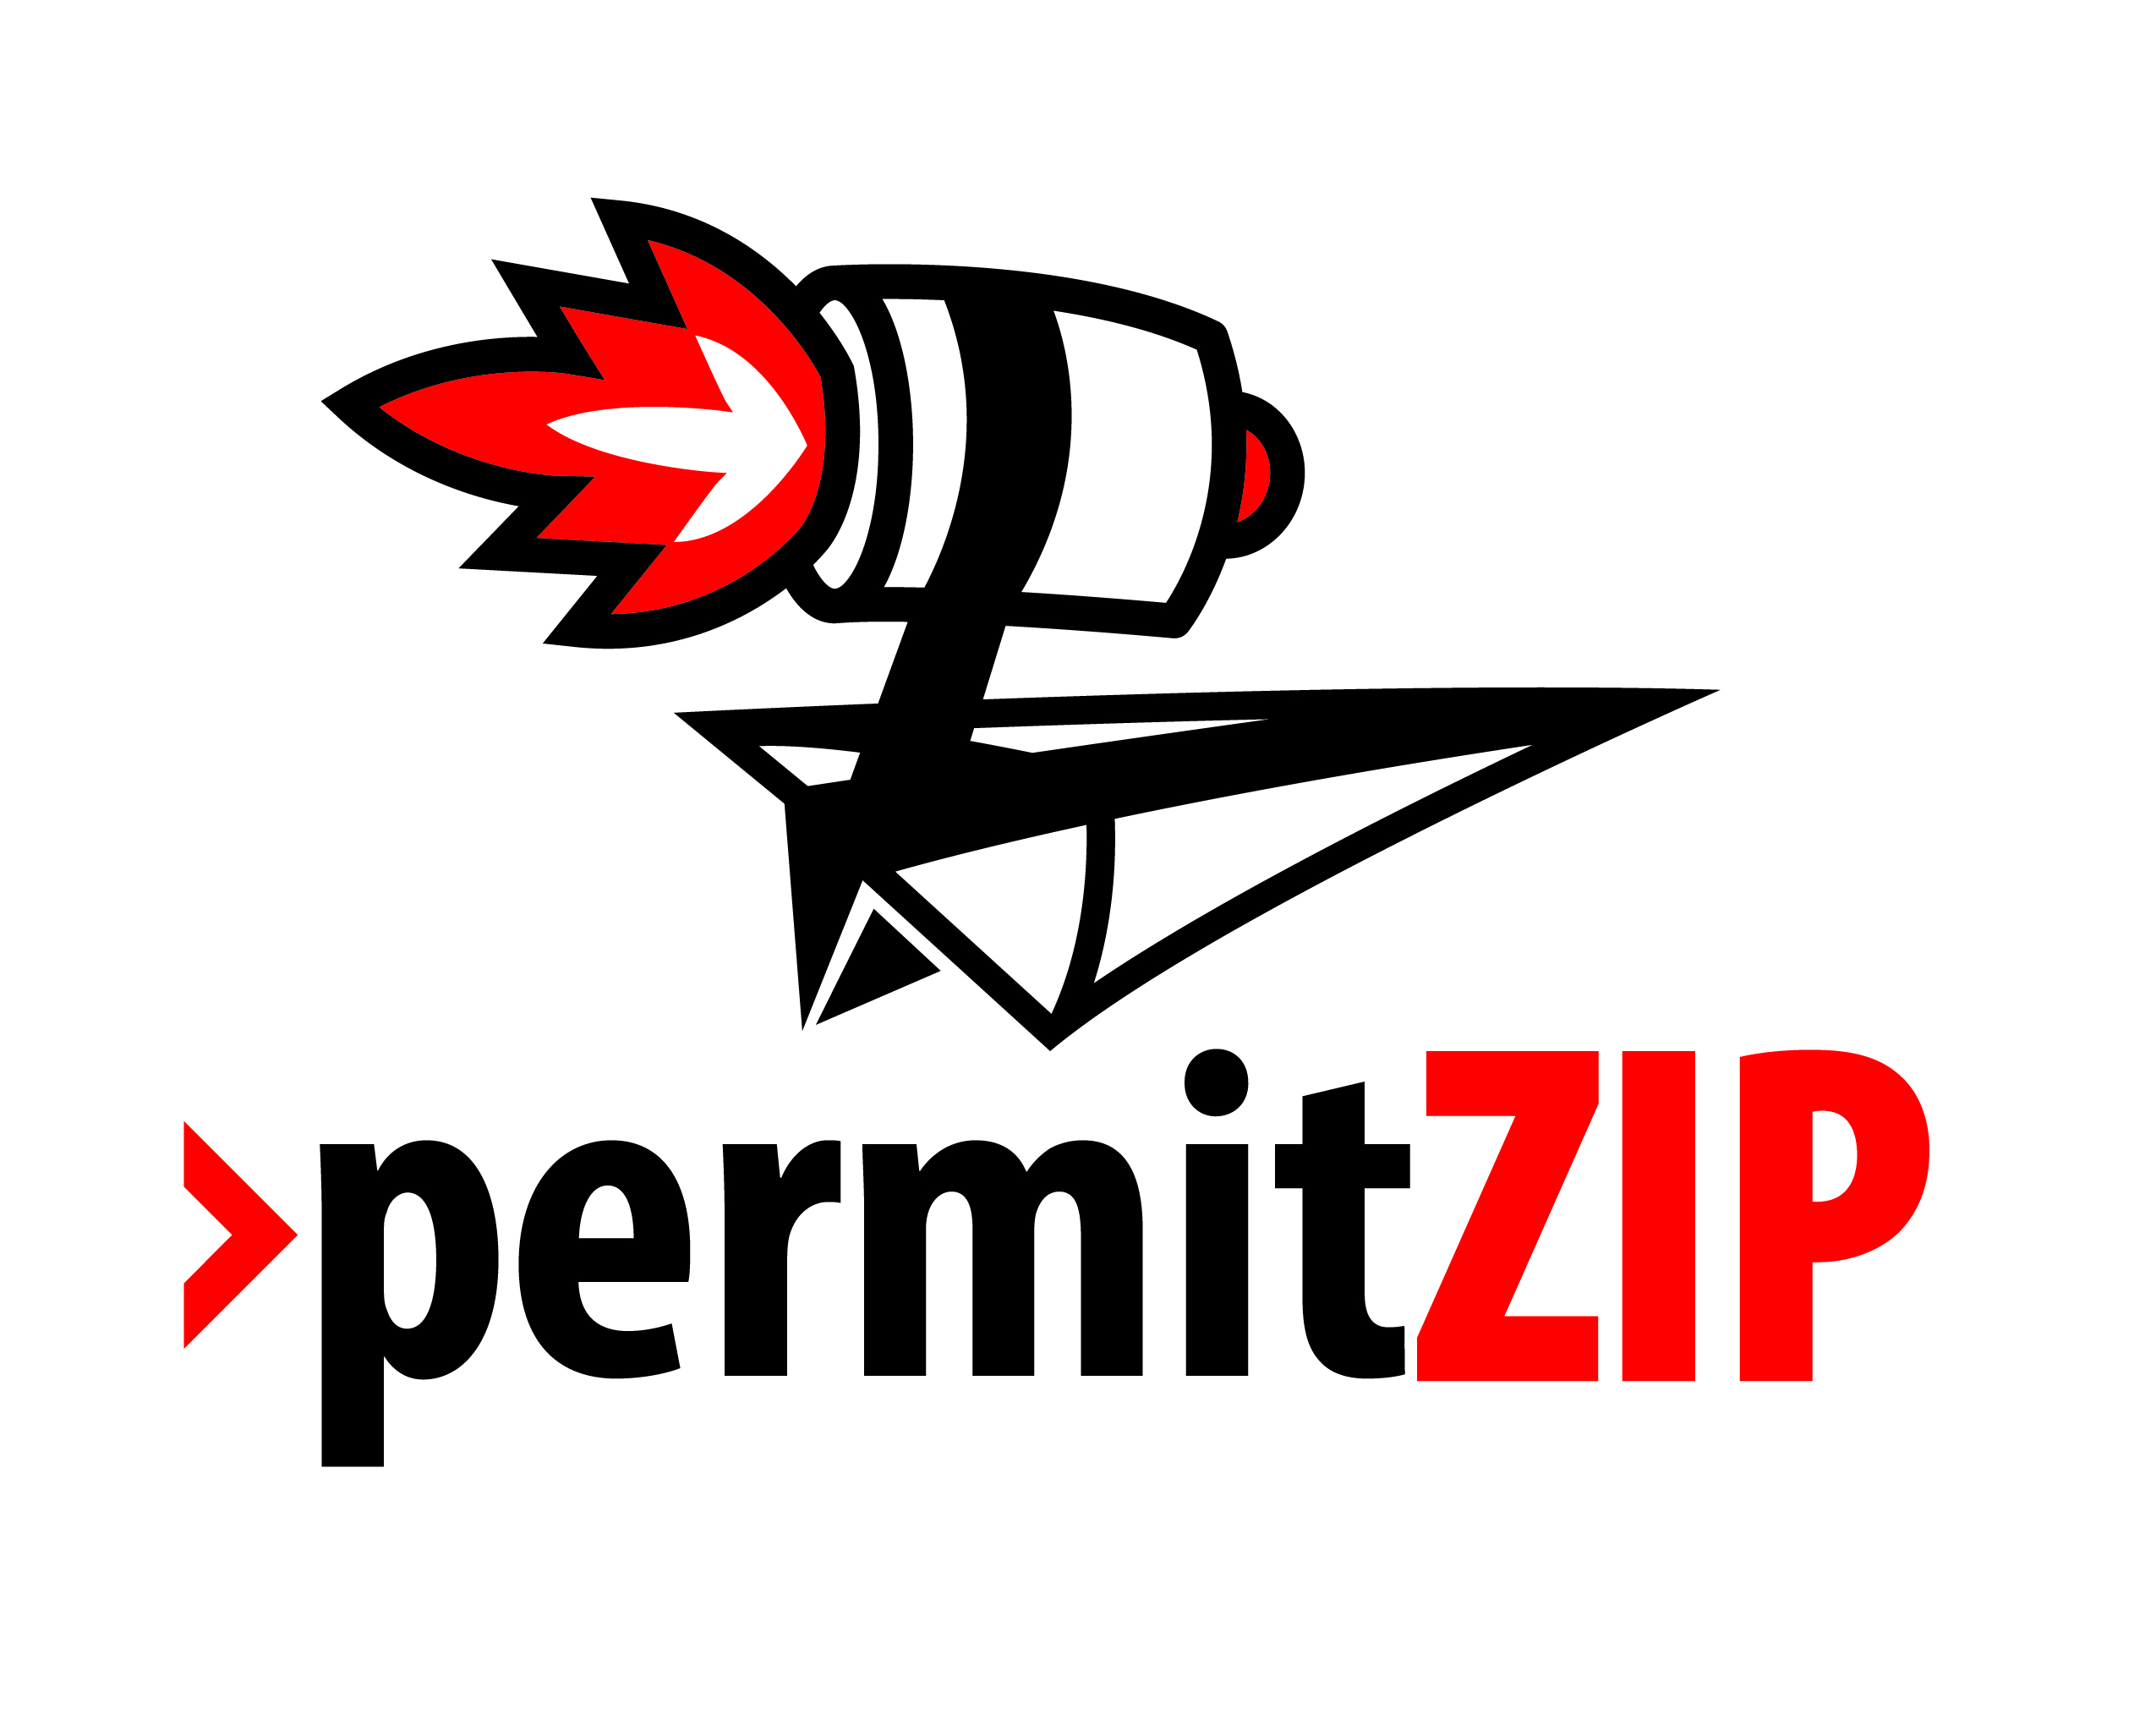 permitzipfinal-01